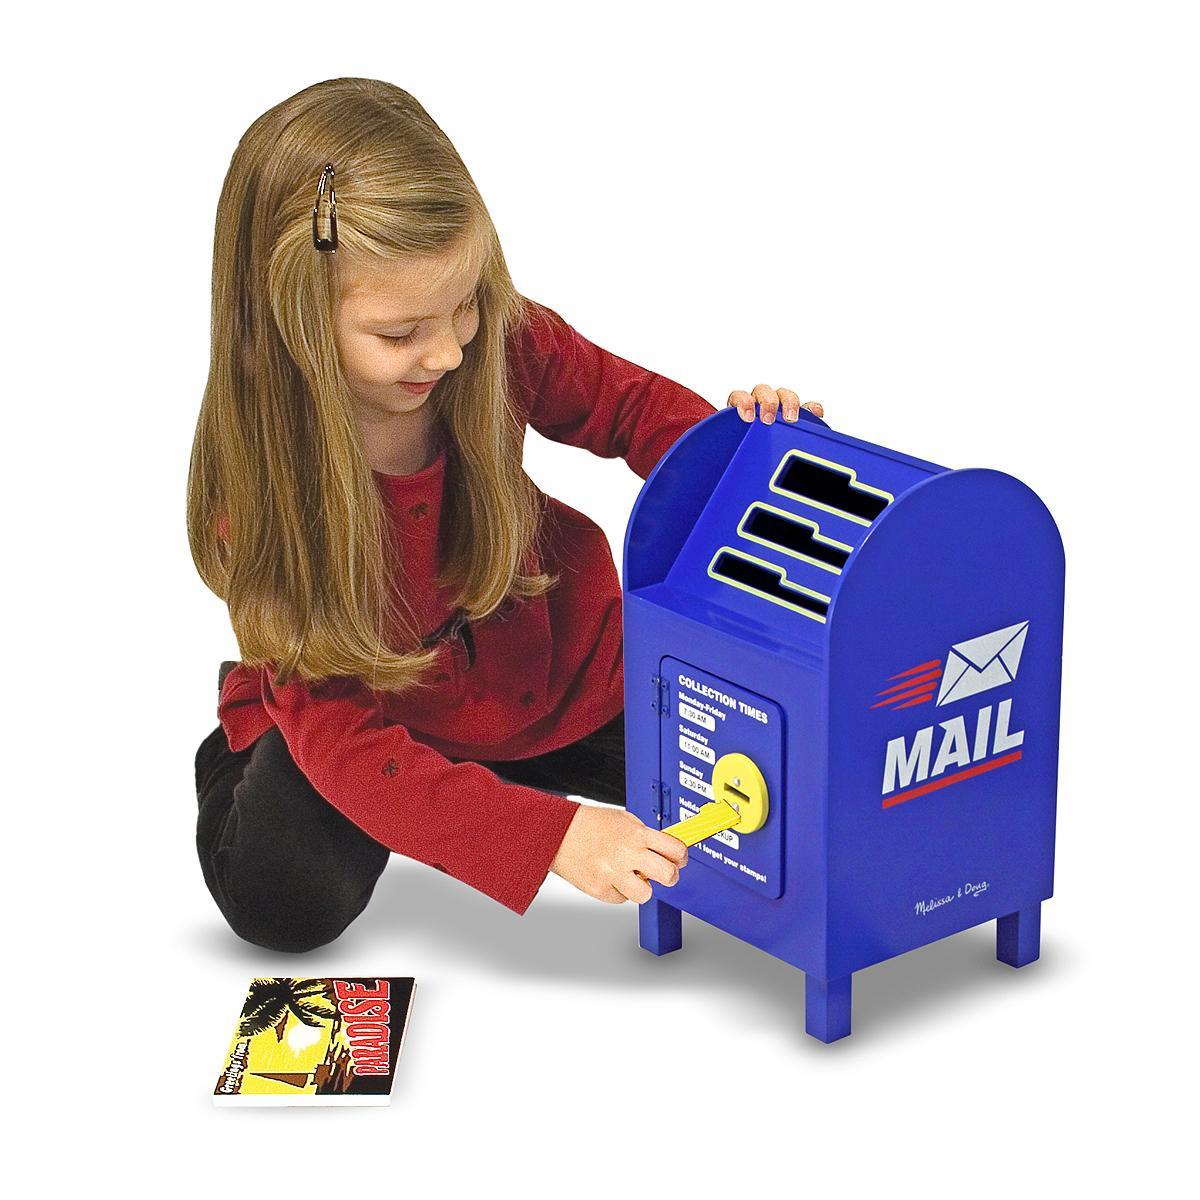 Amazon.com: Melissa & Doug Stamp And Sort Mailbox: Melissa